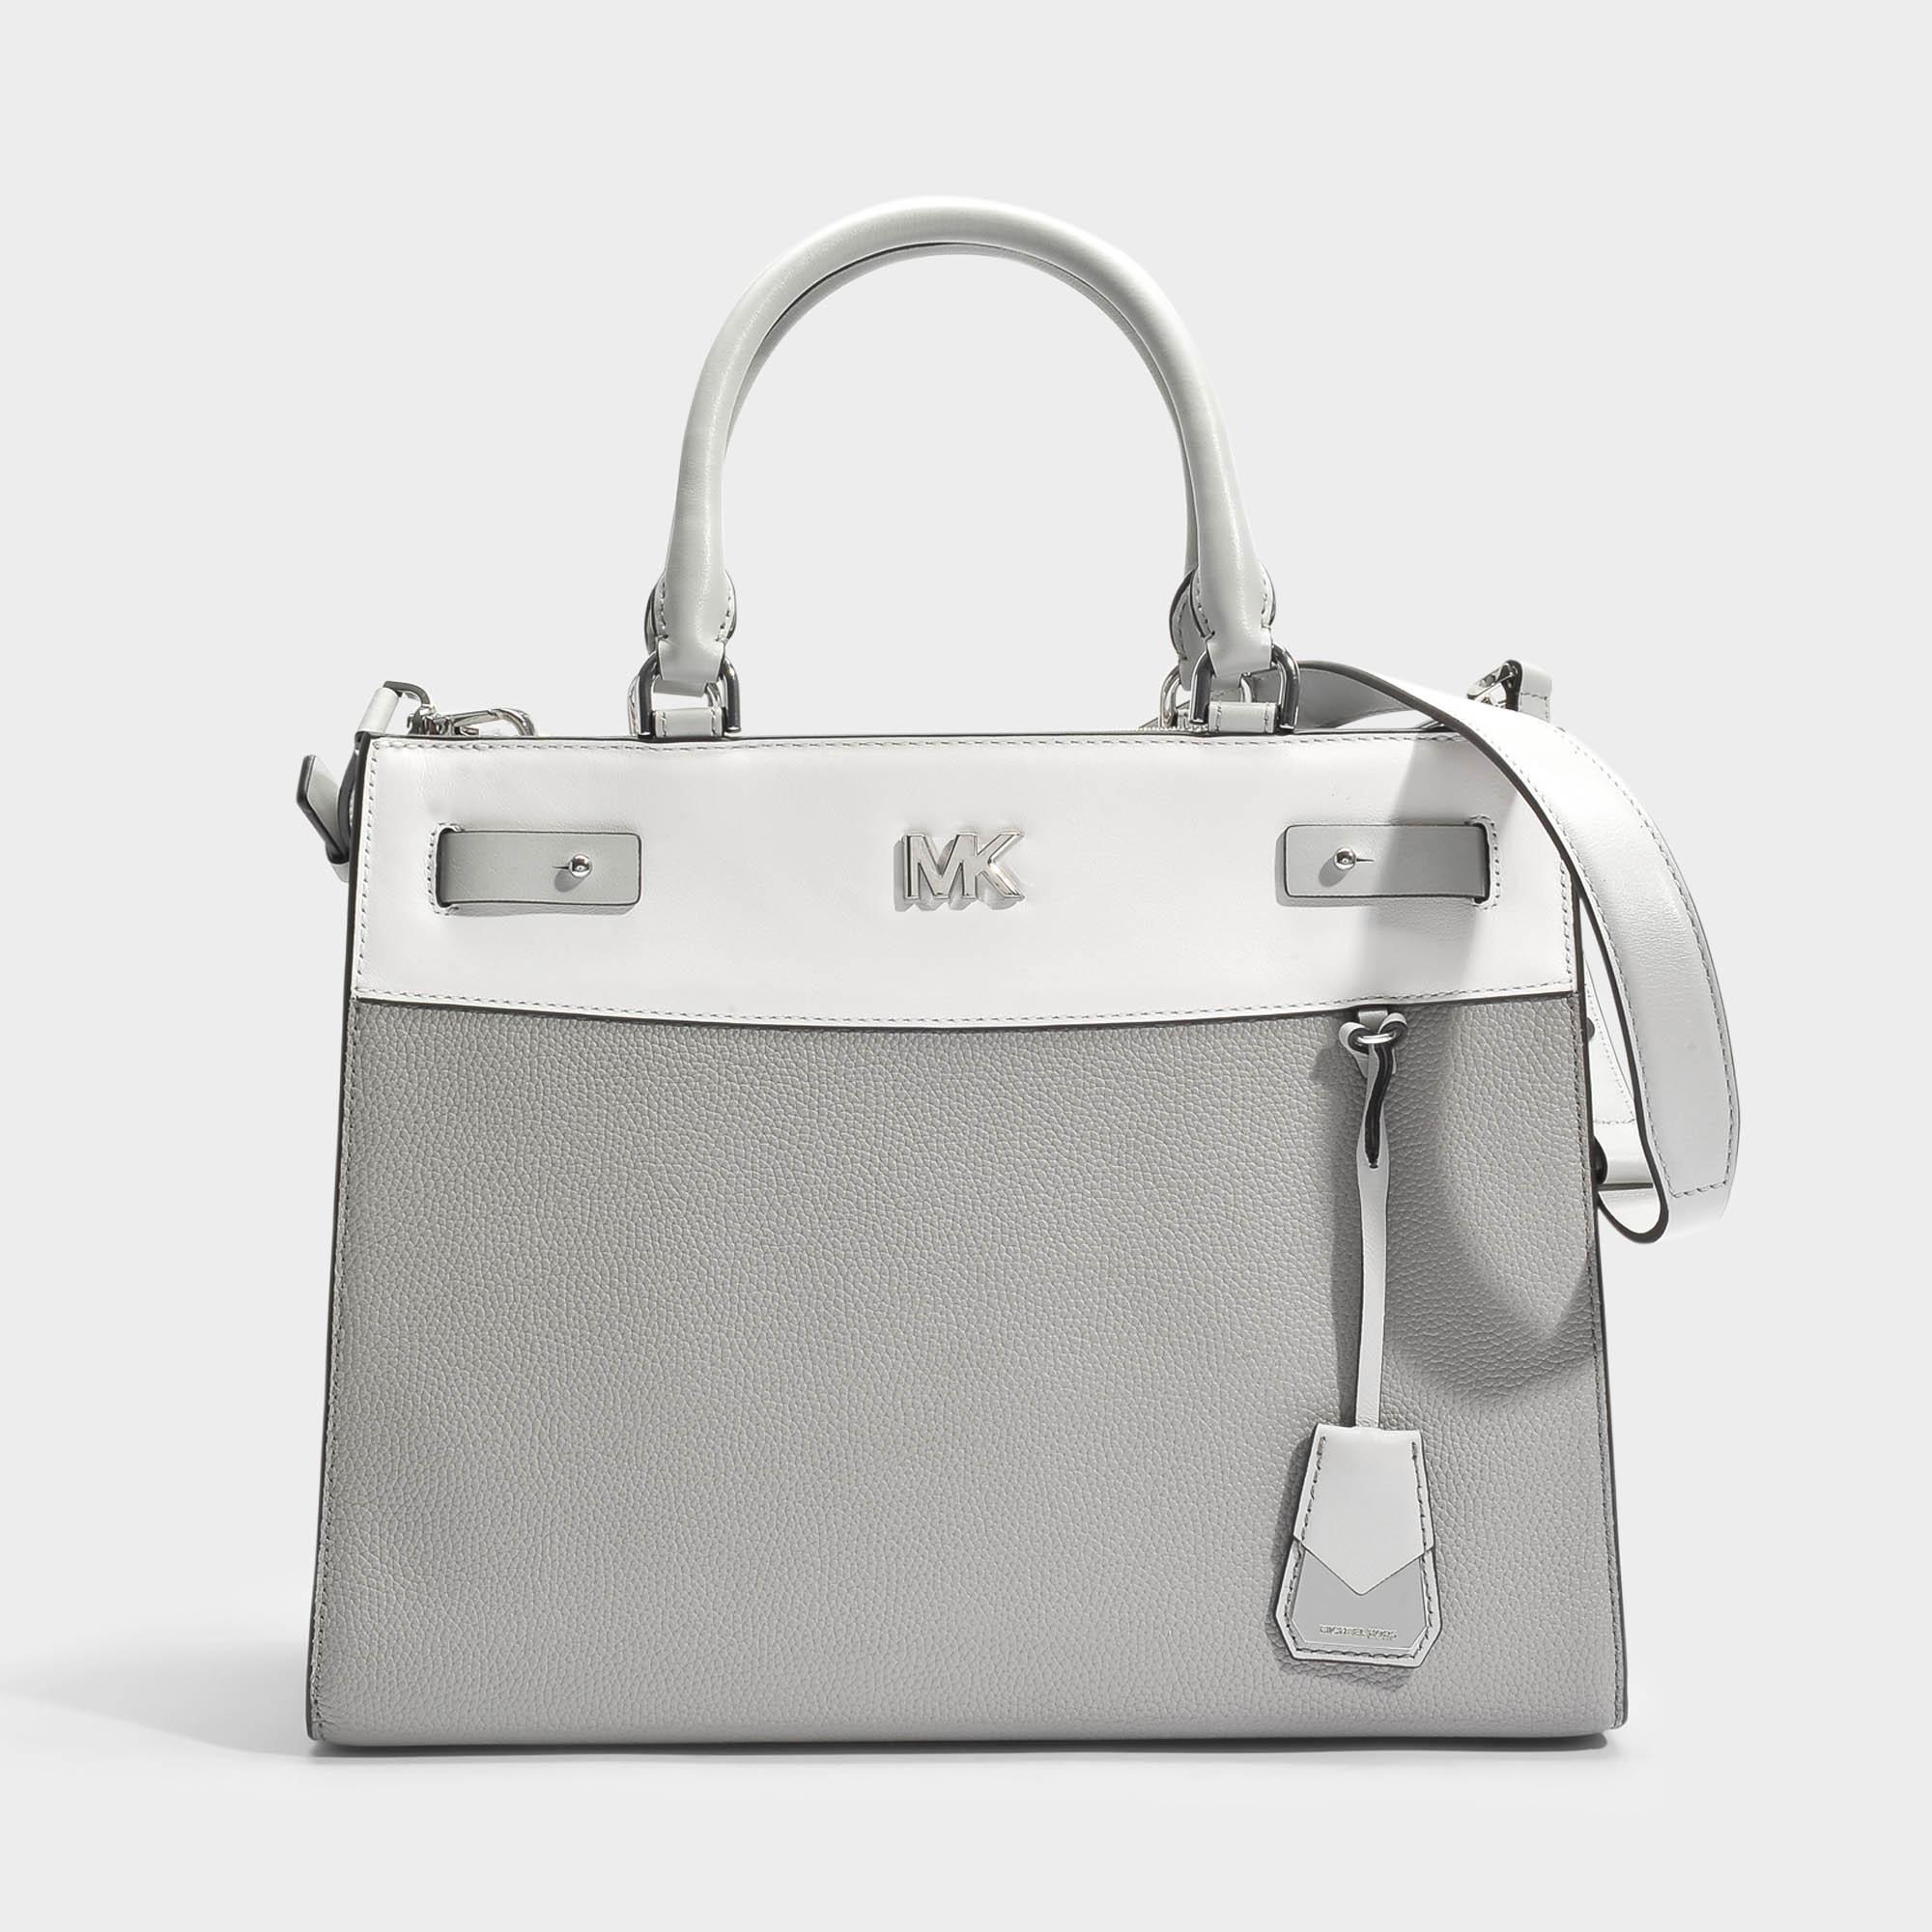 Mott Uptown Large Satchel Bag in Admiral Small Pebble Leather Michael Michael Kors UcuSm